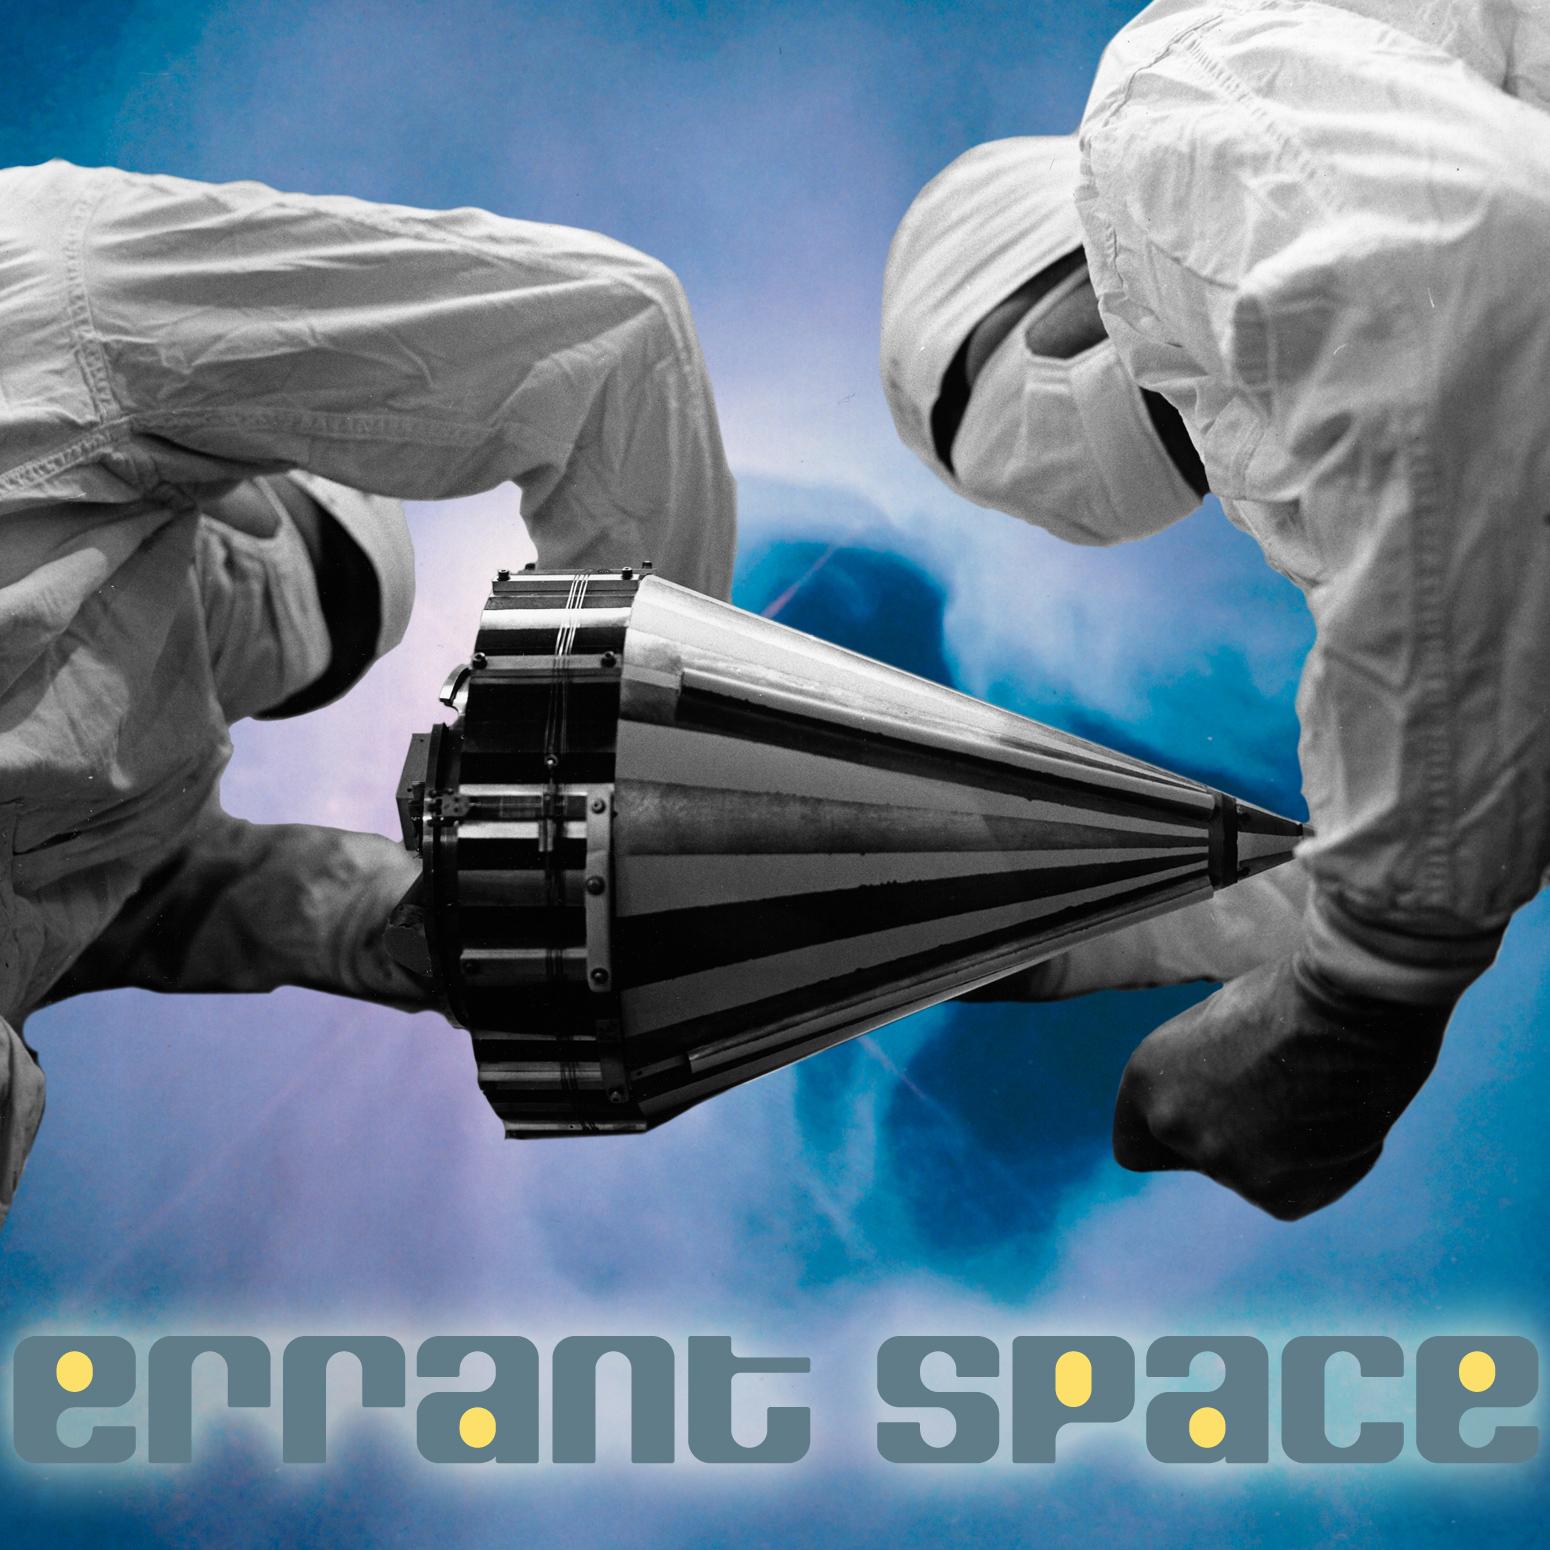 Errant Space